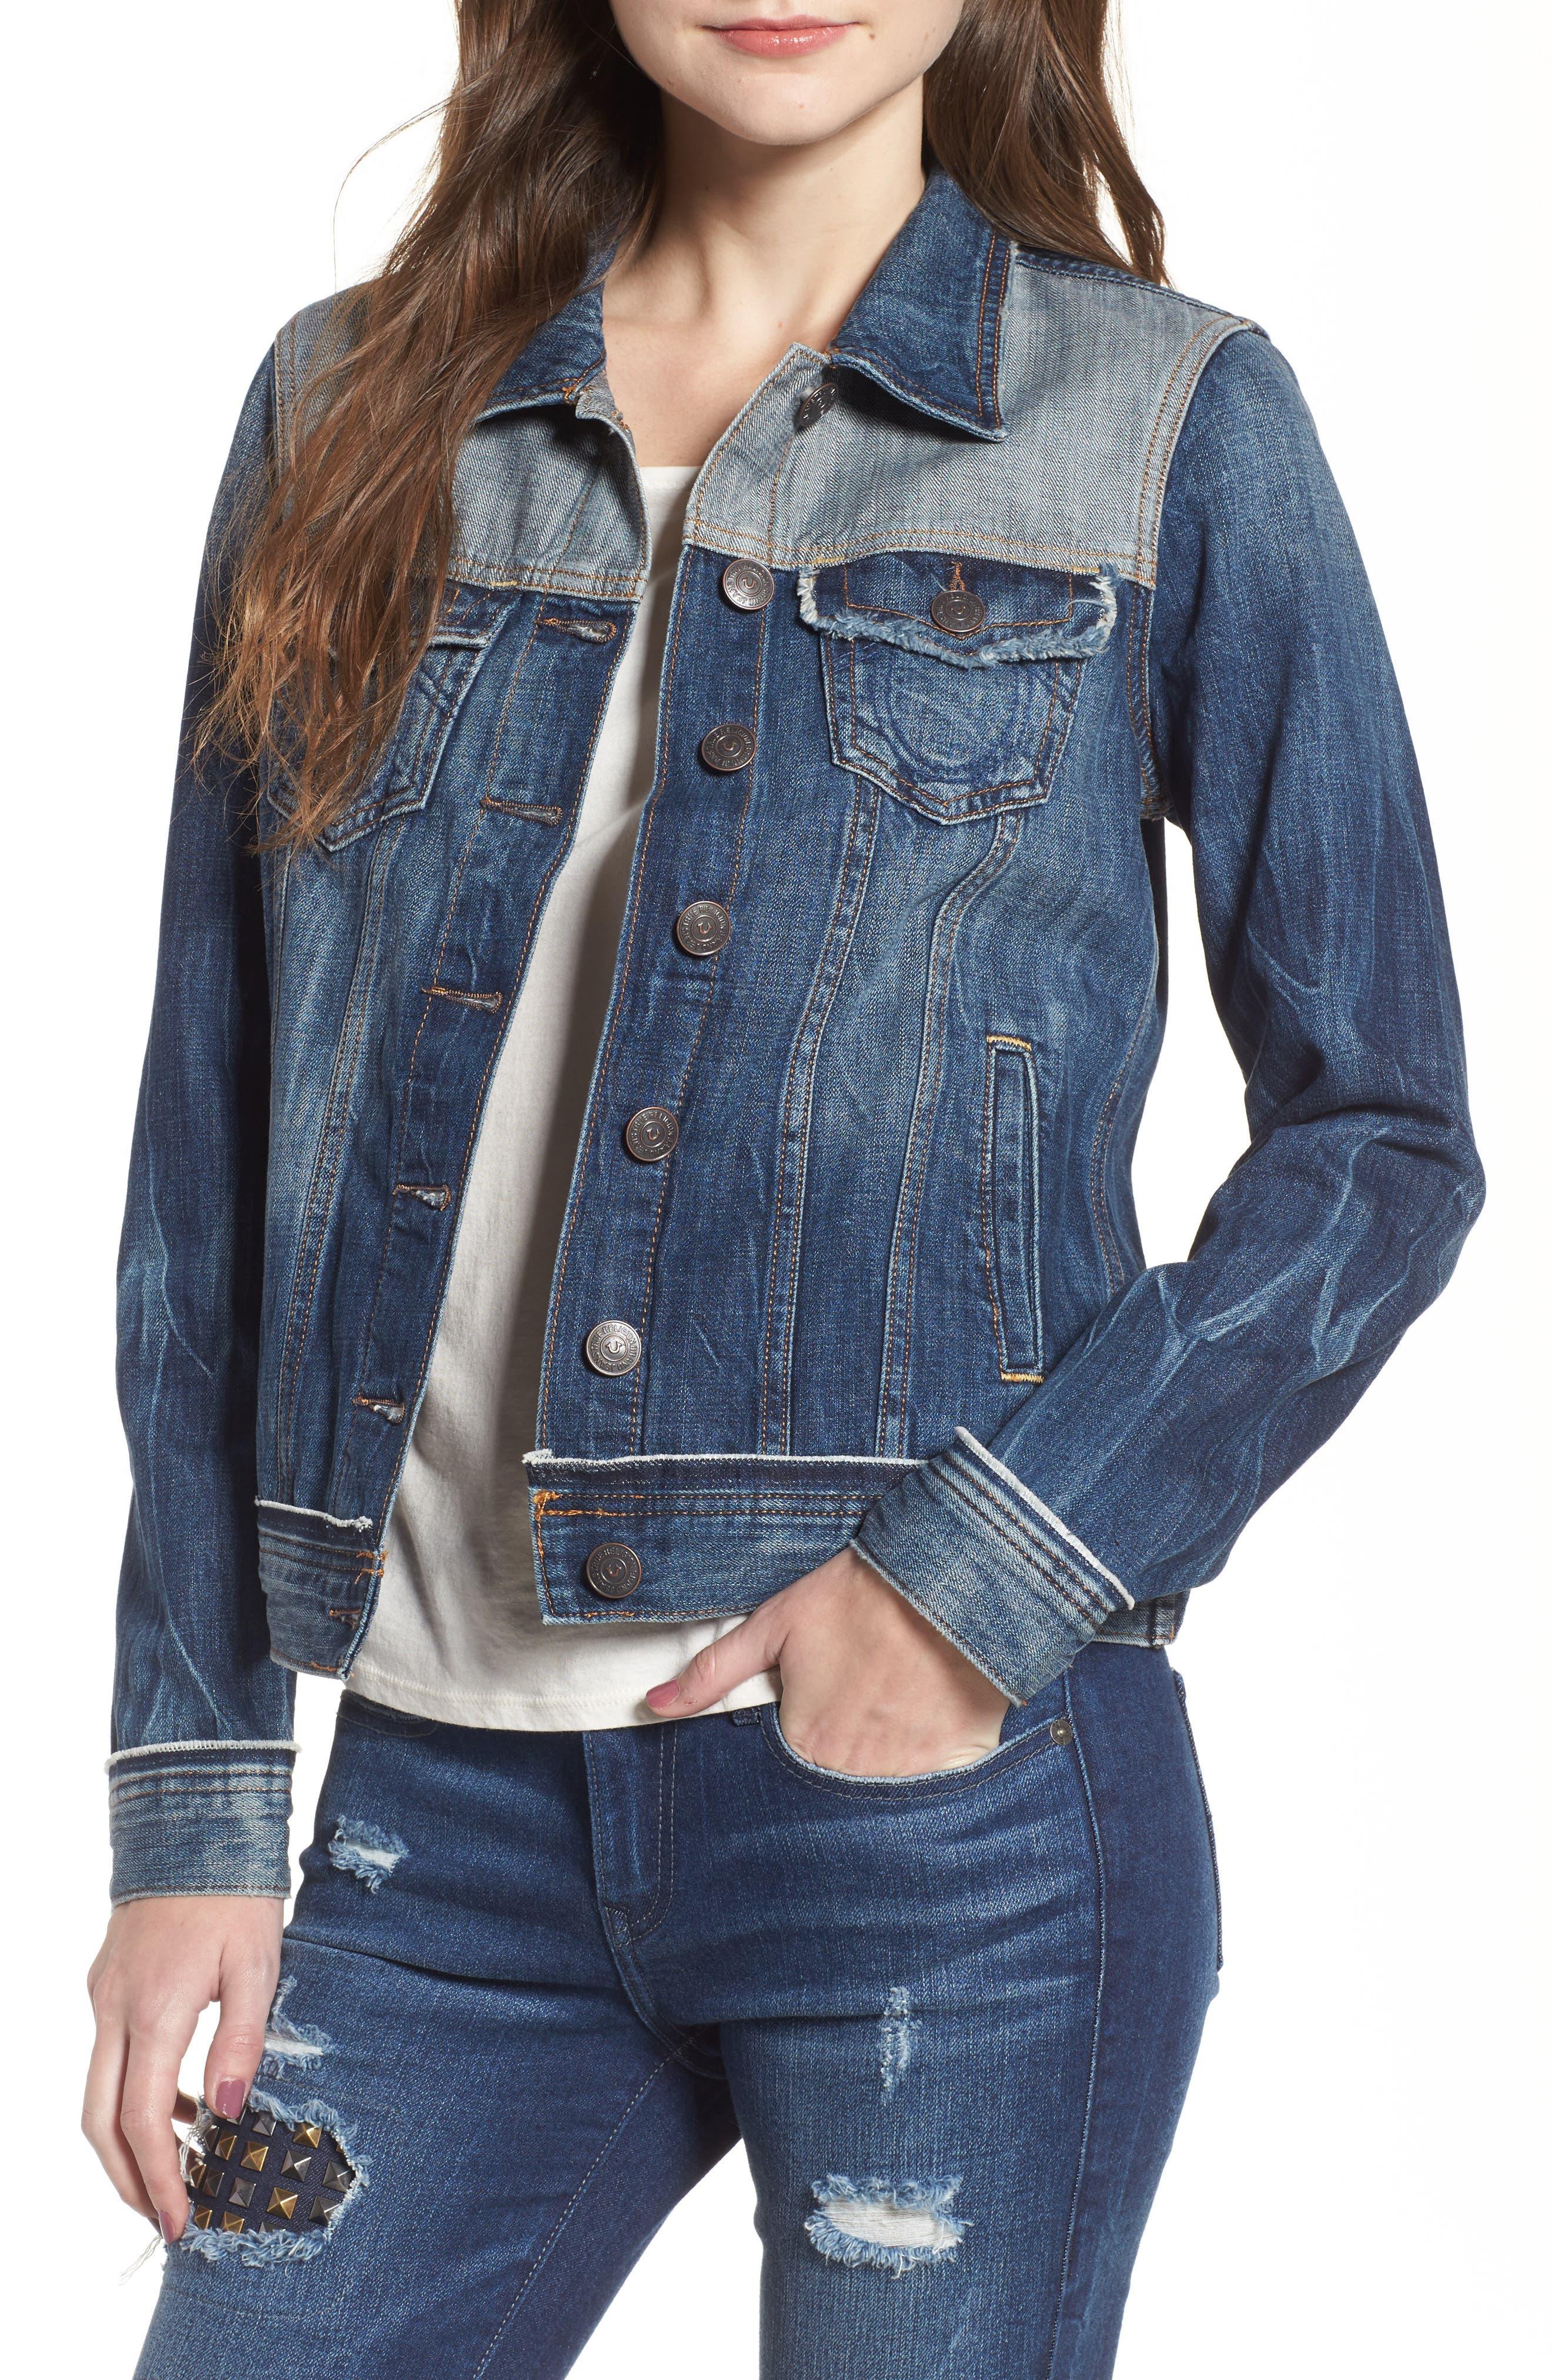 Main Image - True Religion Brand Jeans Let Out Seams Denim Jacket